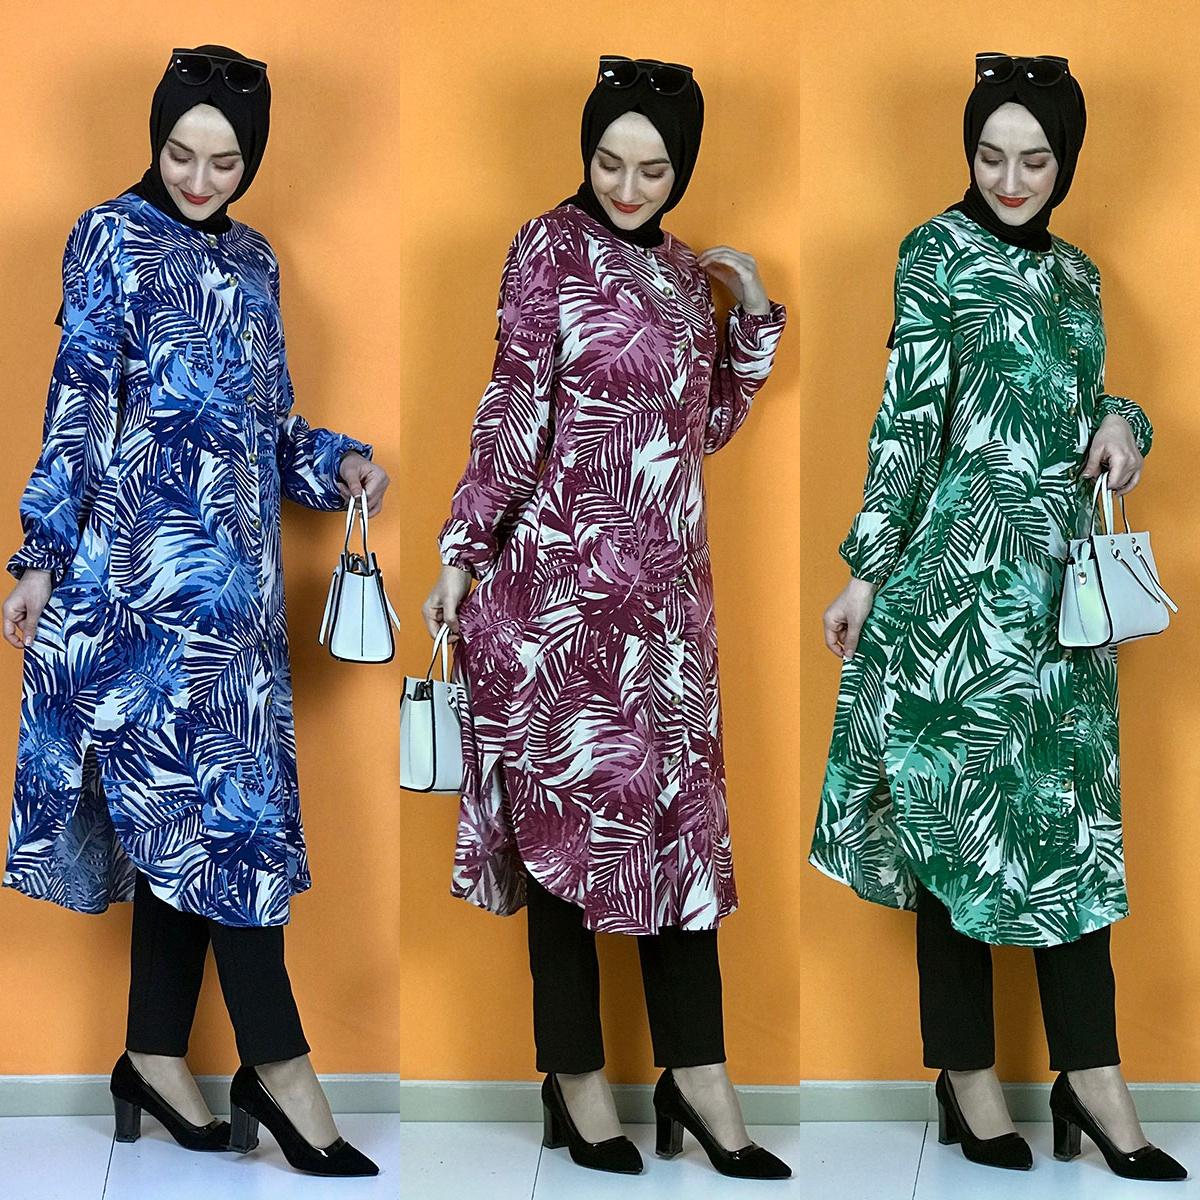 5XL 6XL Plus Size Women Shirt Tops Blouse Patterned Long Sleeve Tunic Muslim Fashion 2021 Spring Femme Top Casual Shirts Blusas